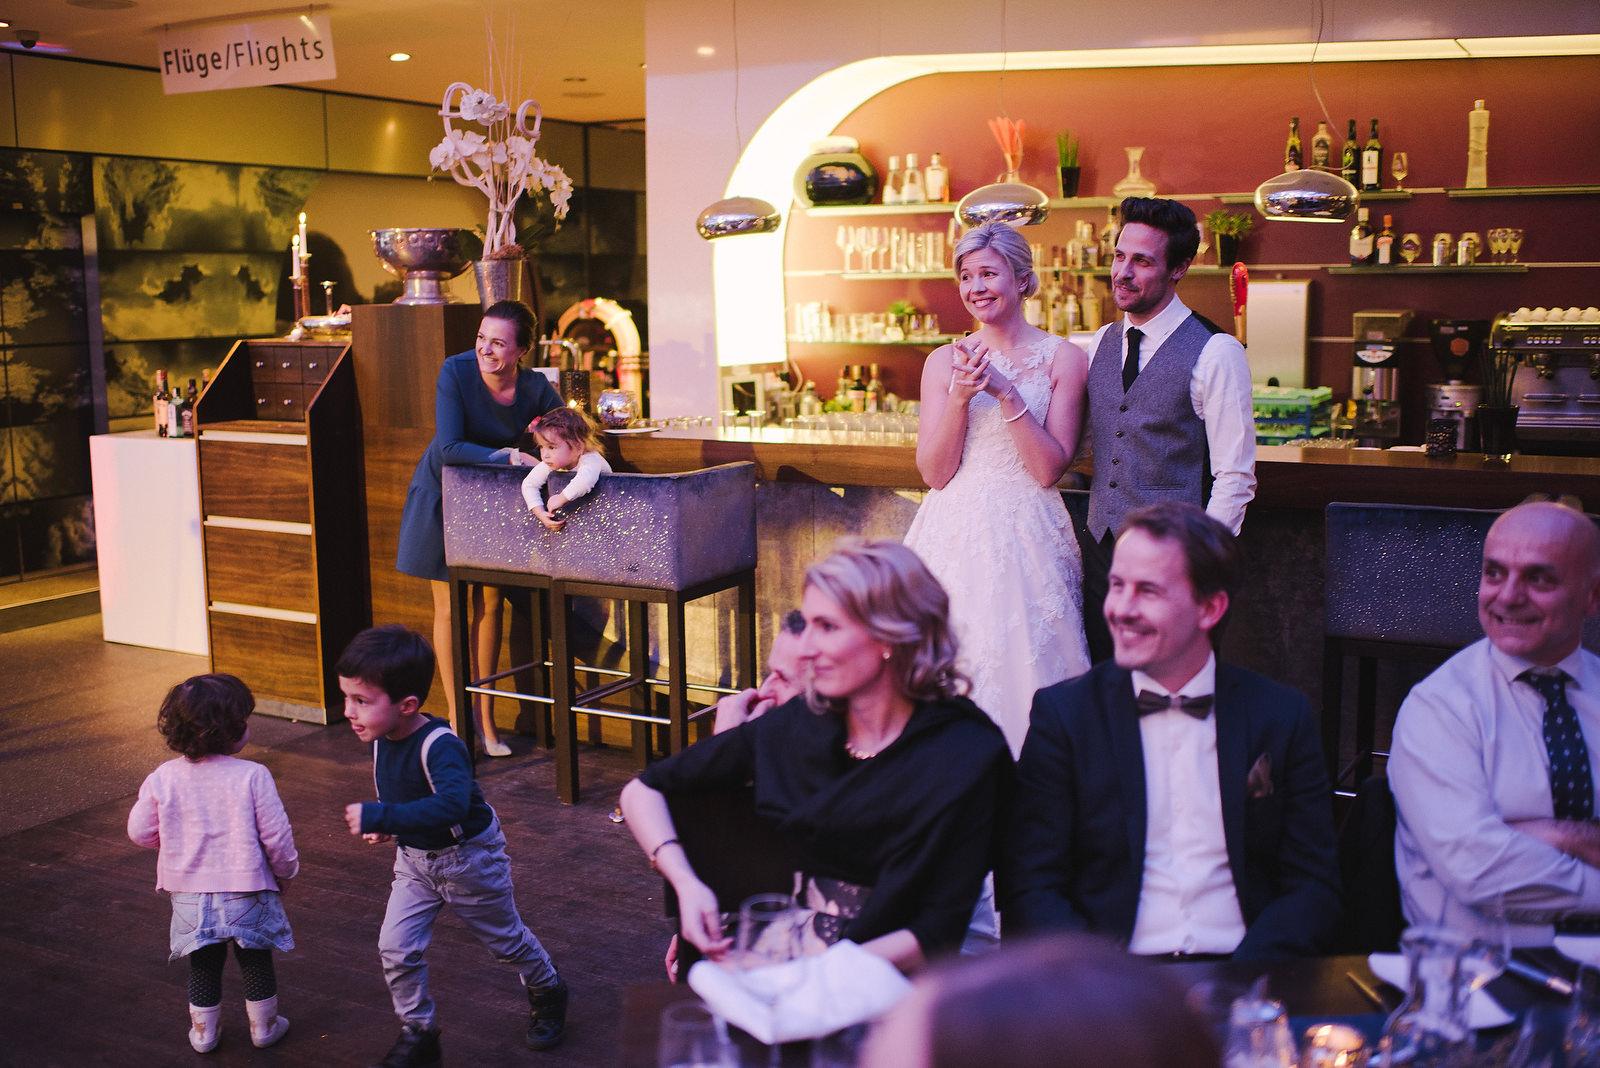 Fotograf Konstanz - Silvester Wedding in Hagnau / Friedrichshafen at Lake of Constance  - 41 -